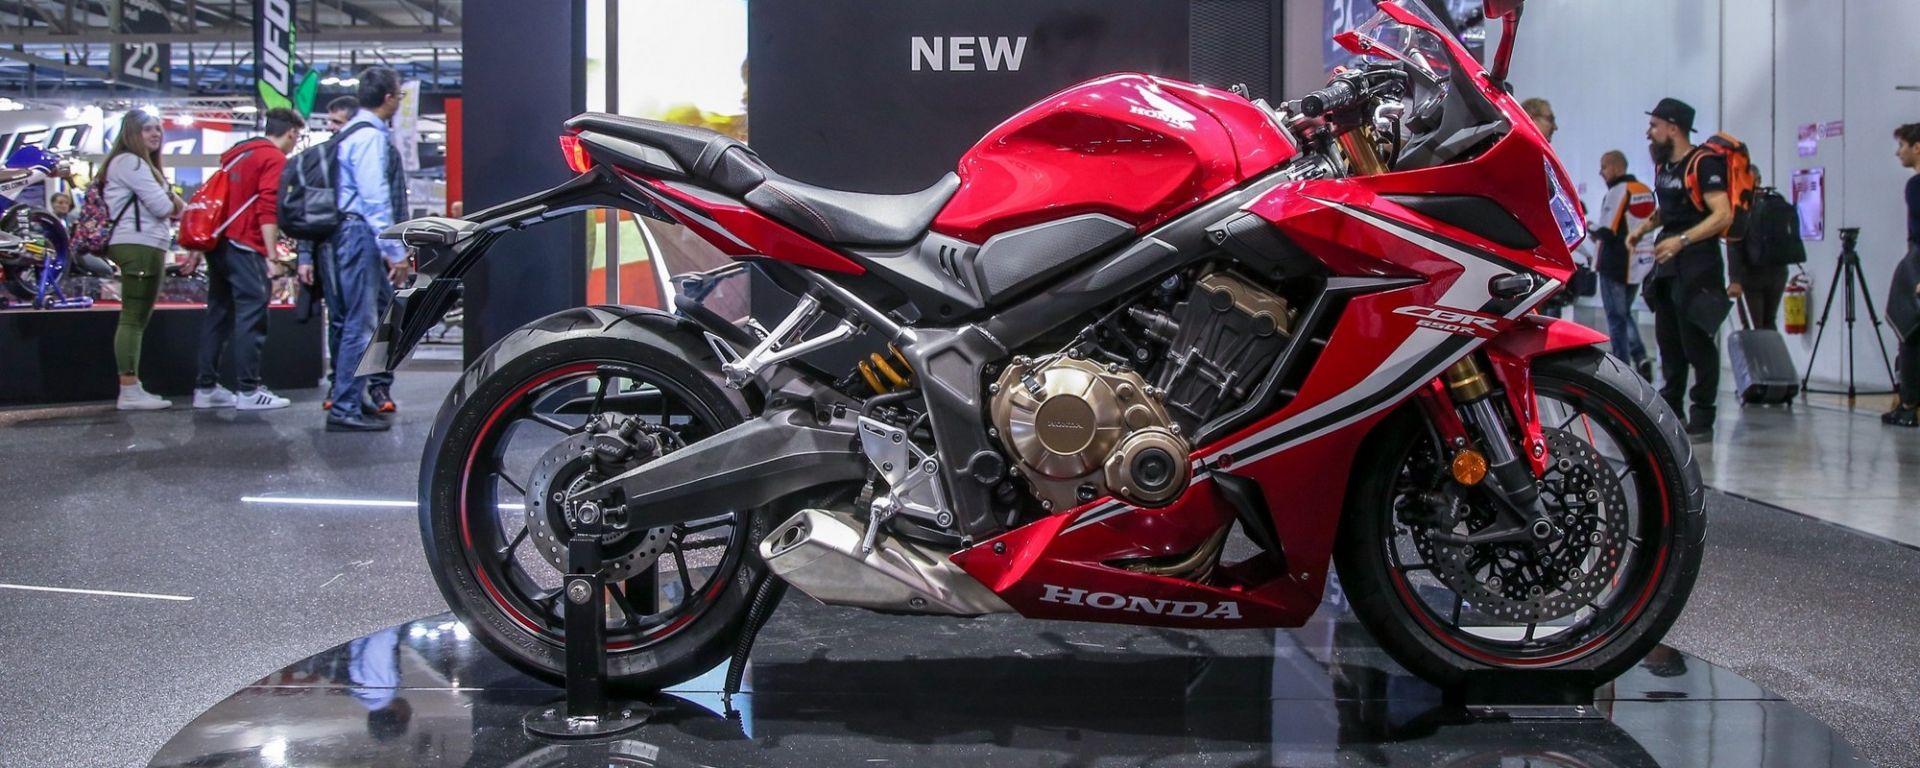 Honda CBR650R, Eicma 2018